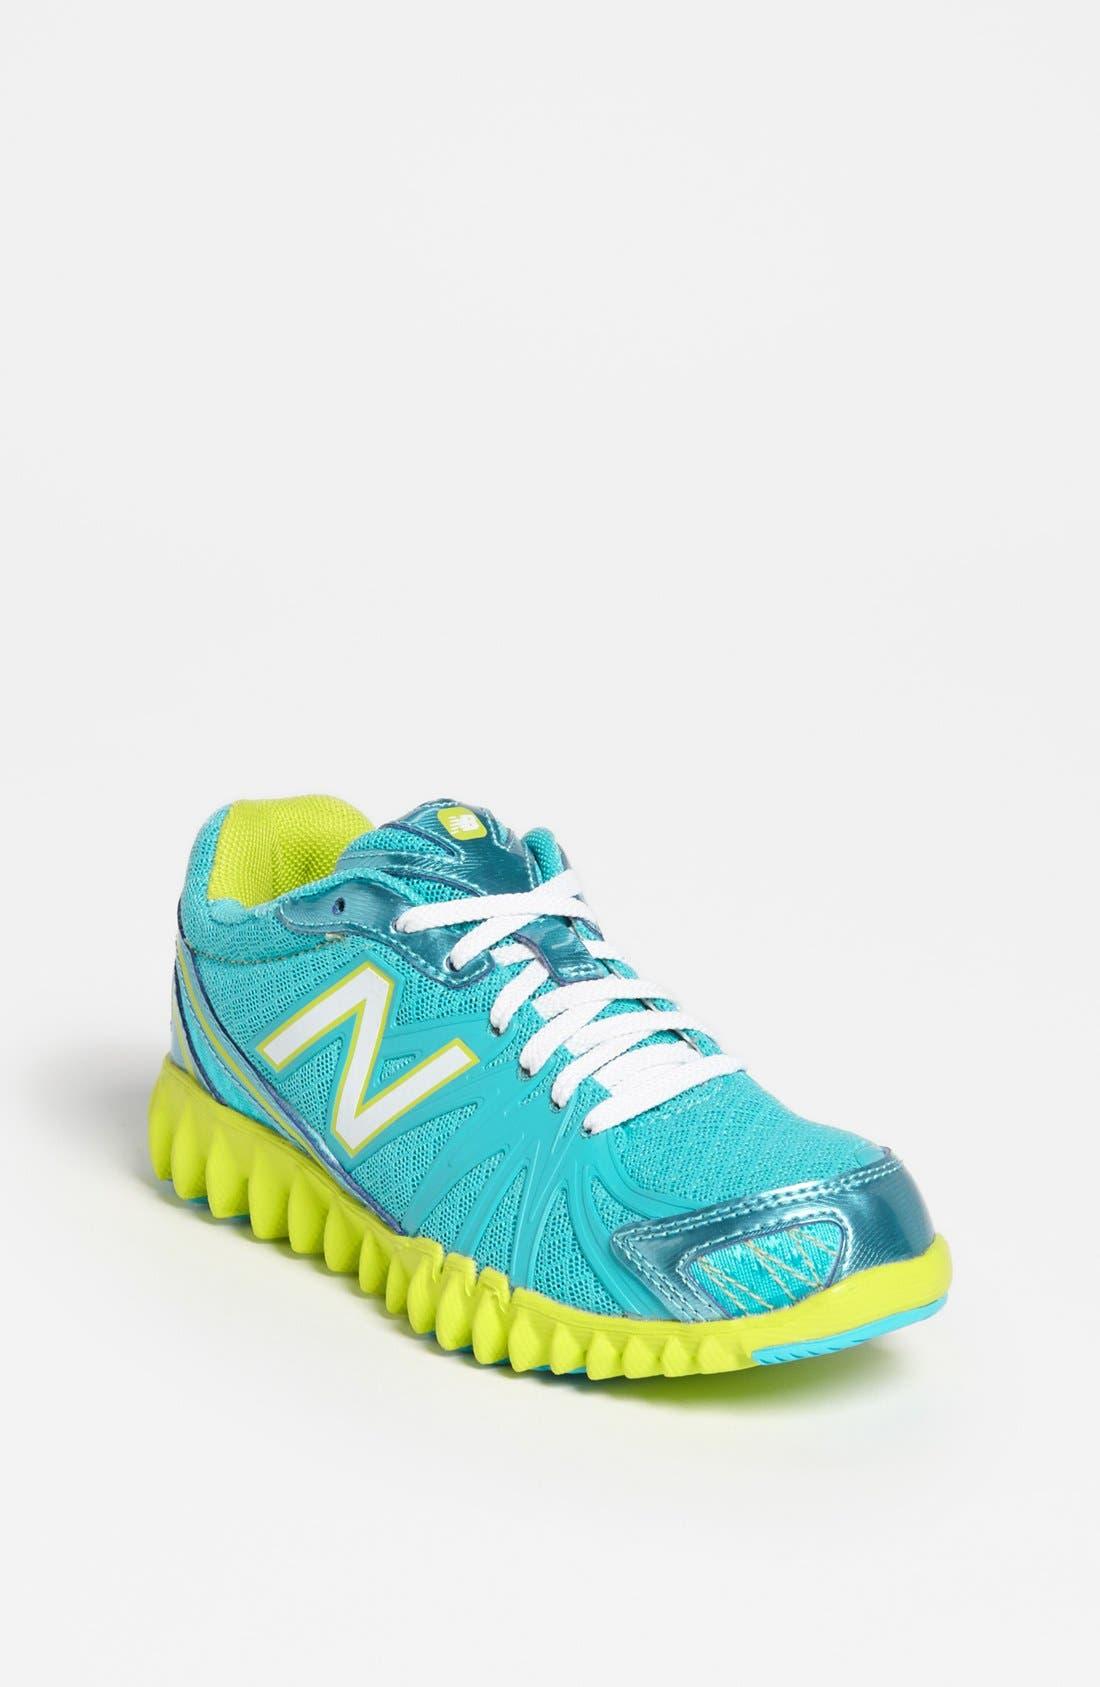 Alternate Image 1 Selected - New Balance 'Takedown 2750' Running Shoe (Toddler, Little Kid & Big Kid)